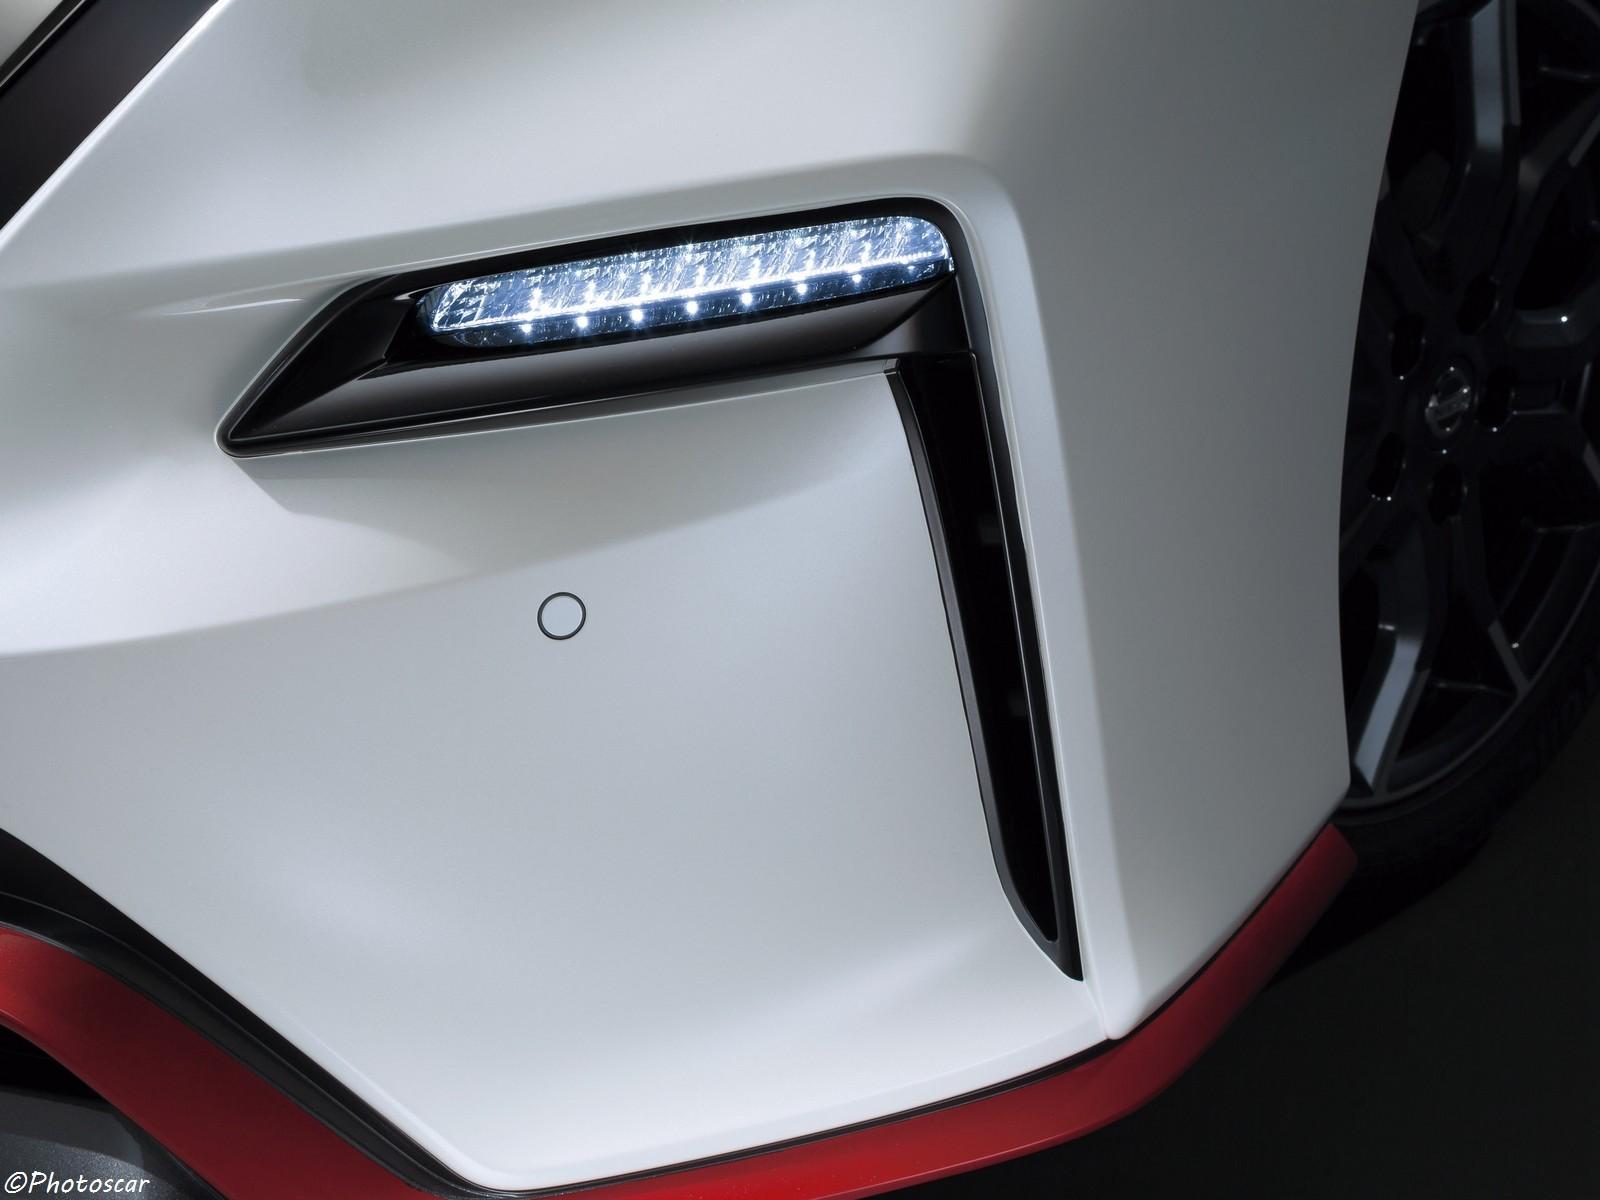 Nismo Nissan Serena 2017